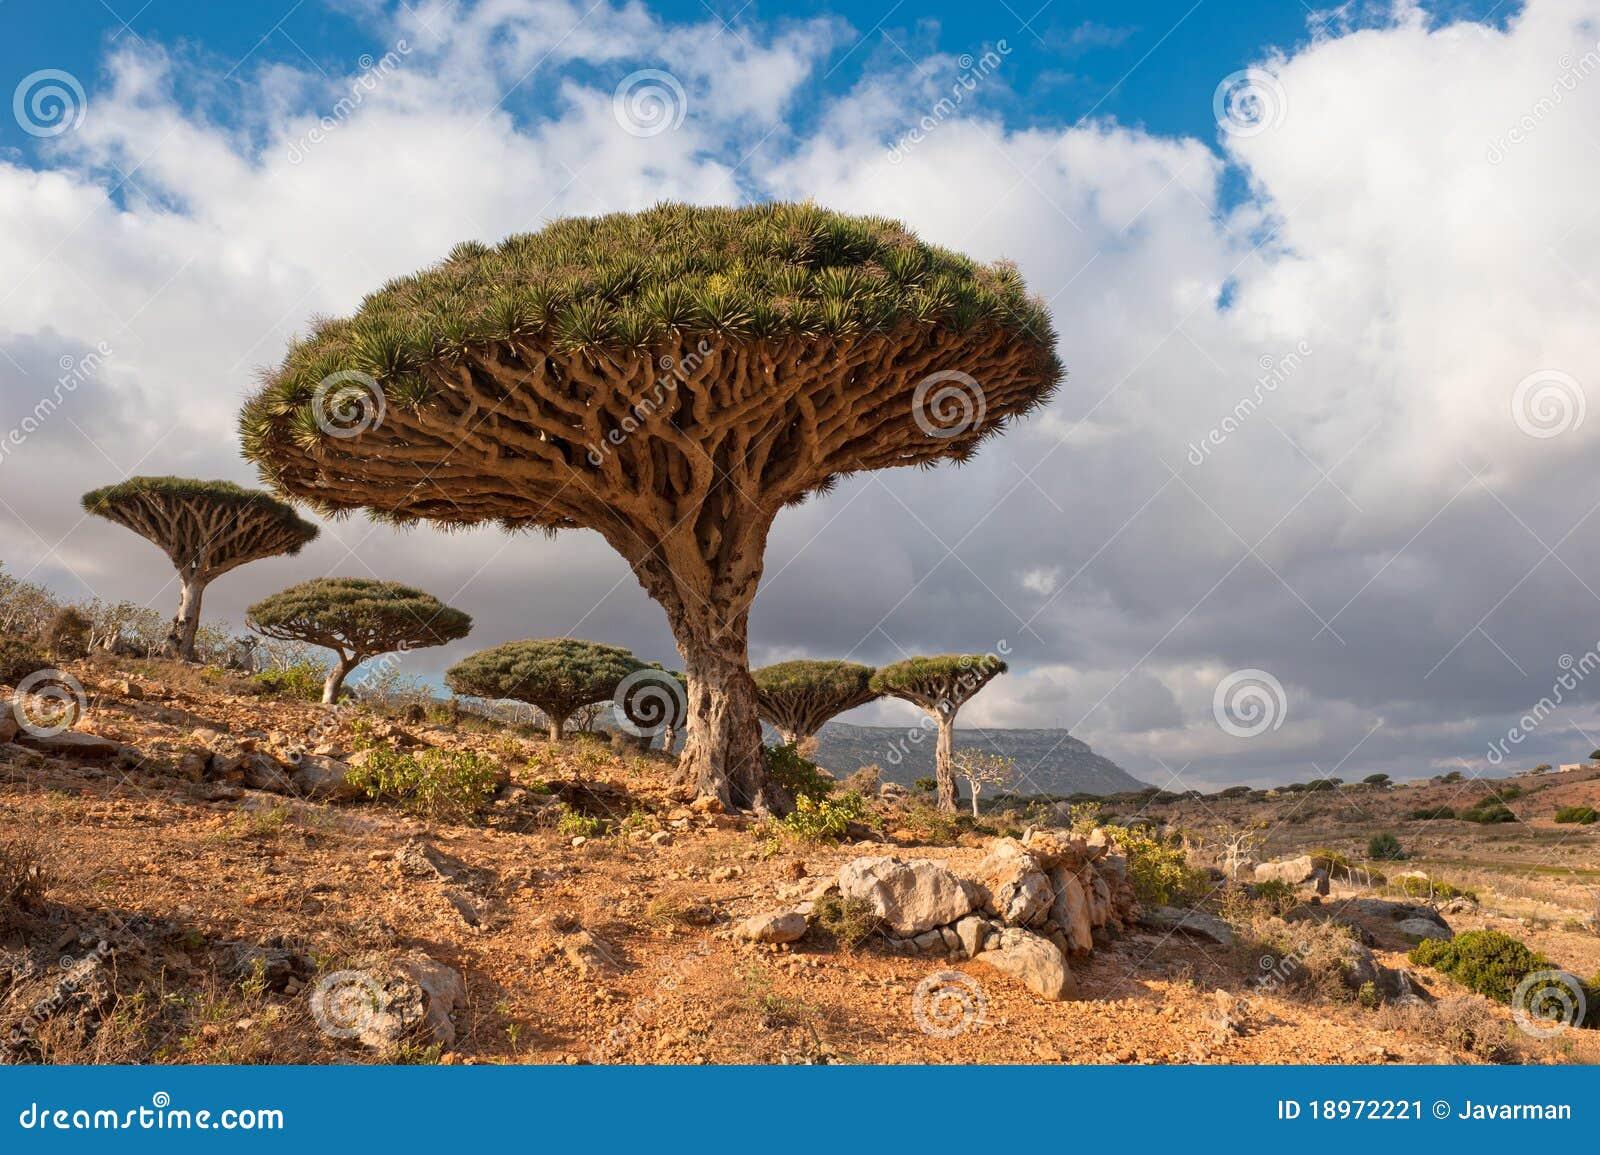 Dragon trees at Homhil plateau, Socotra, Yemen